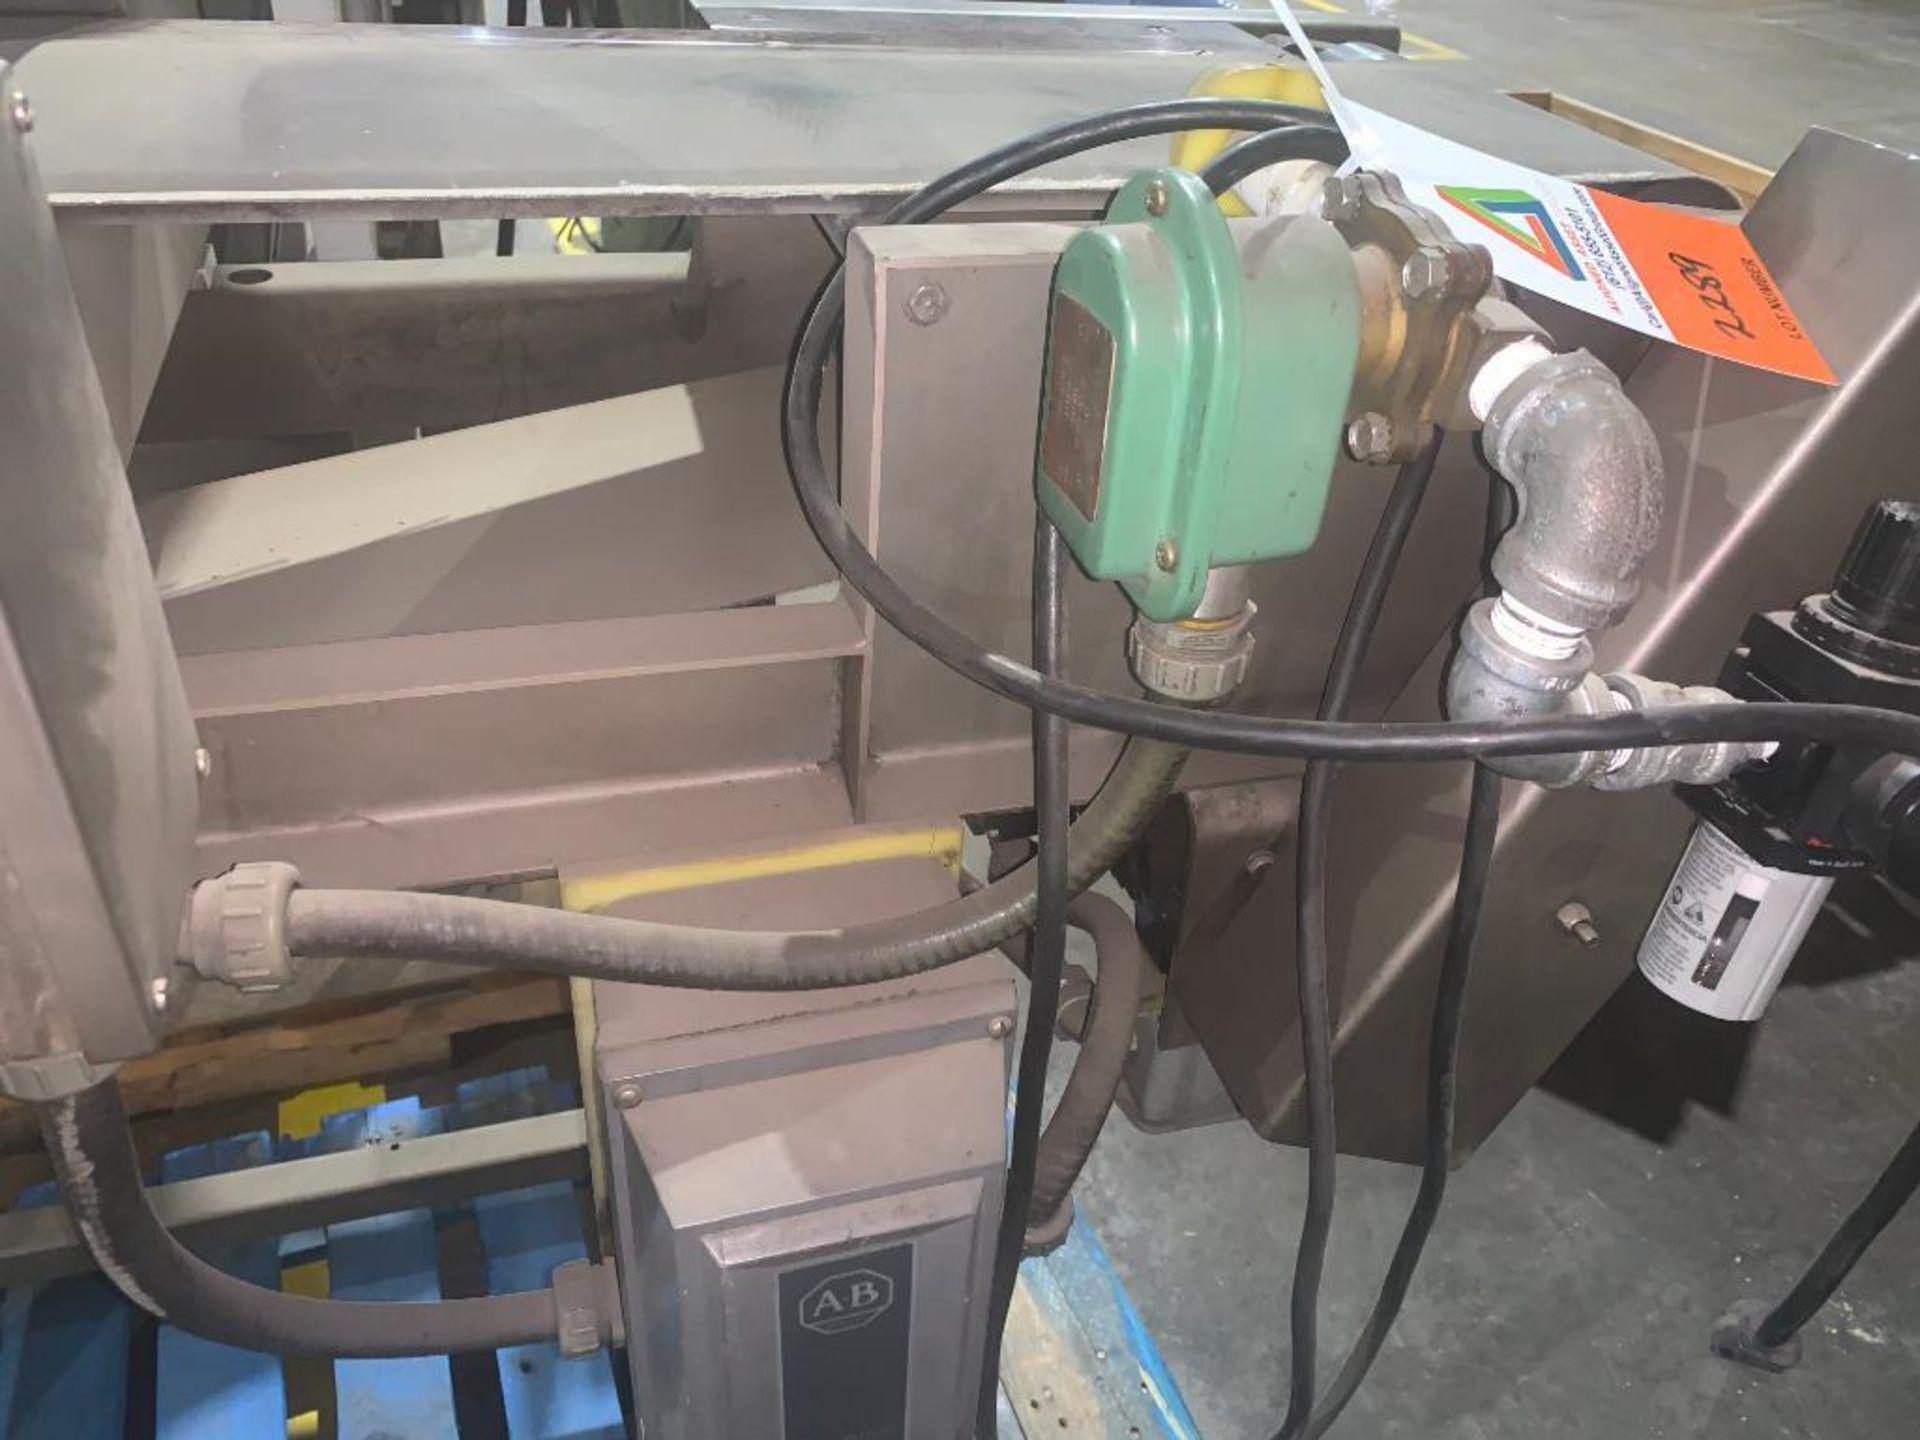 Loma metal detector - Image 8 of 10